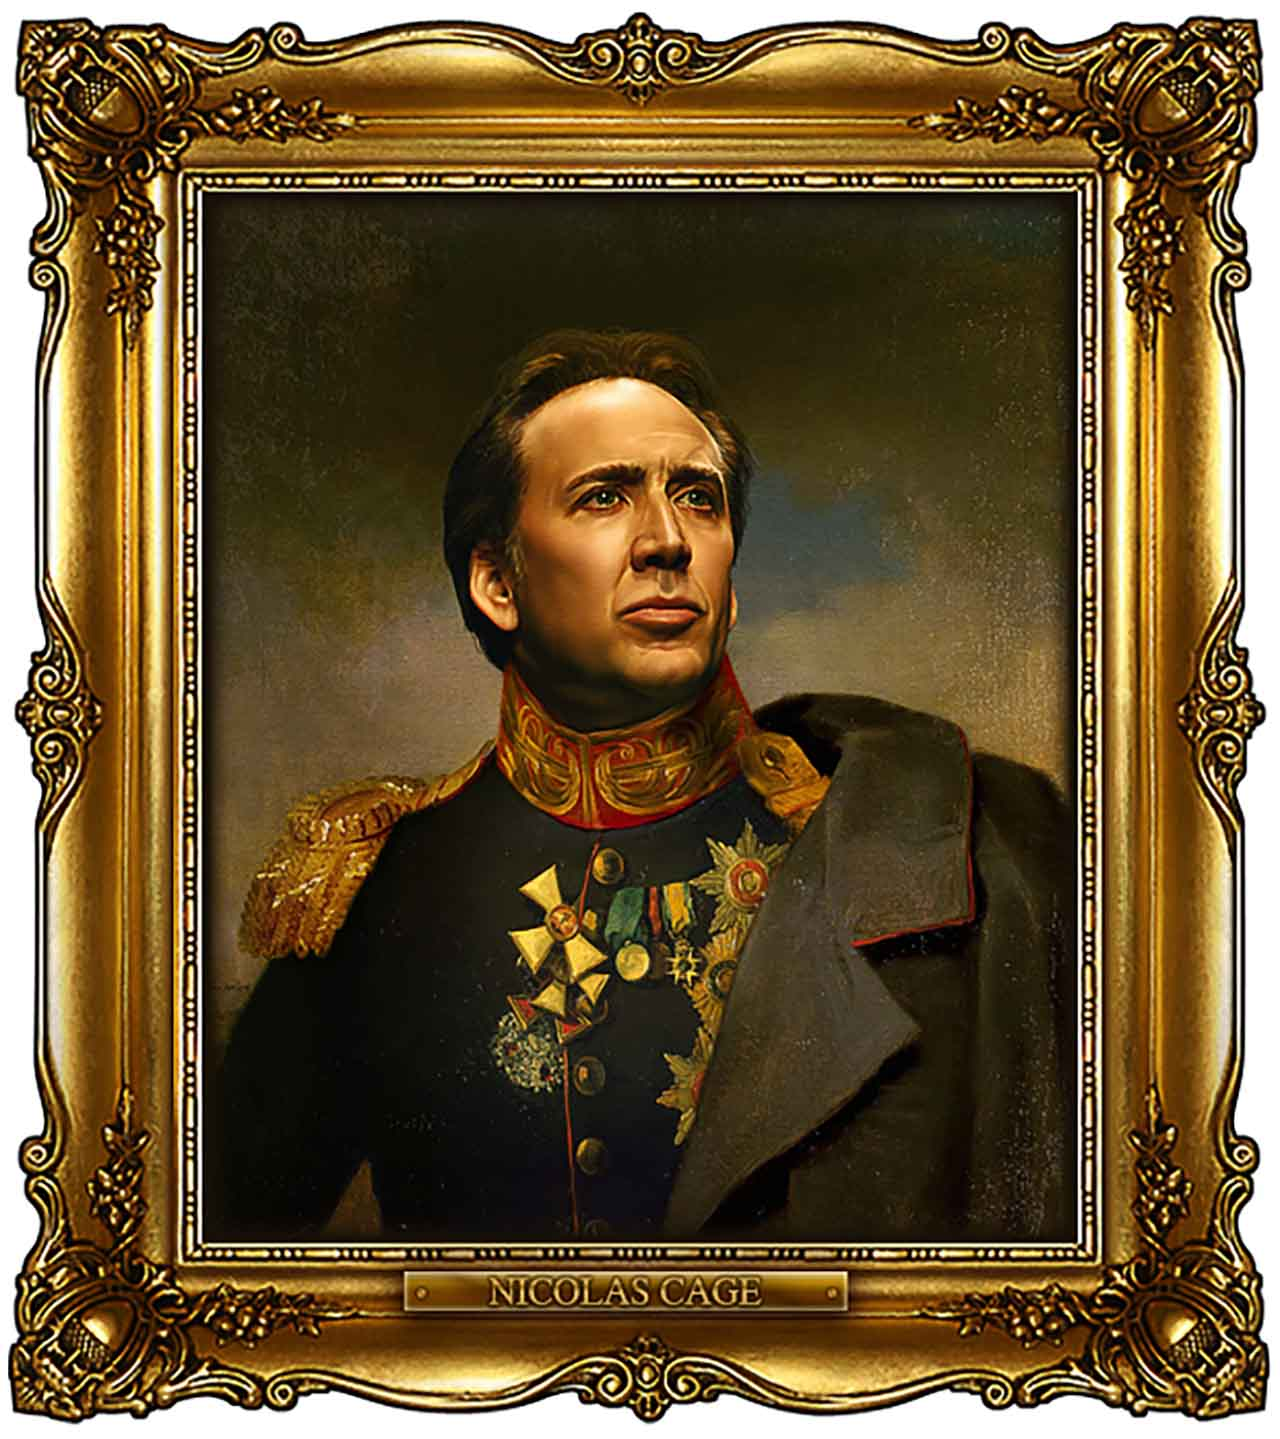 Artist Turns Famous Actors Into Russian Generals - Nicolas Cage